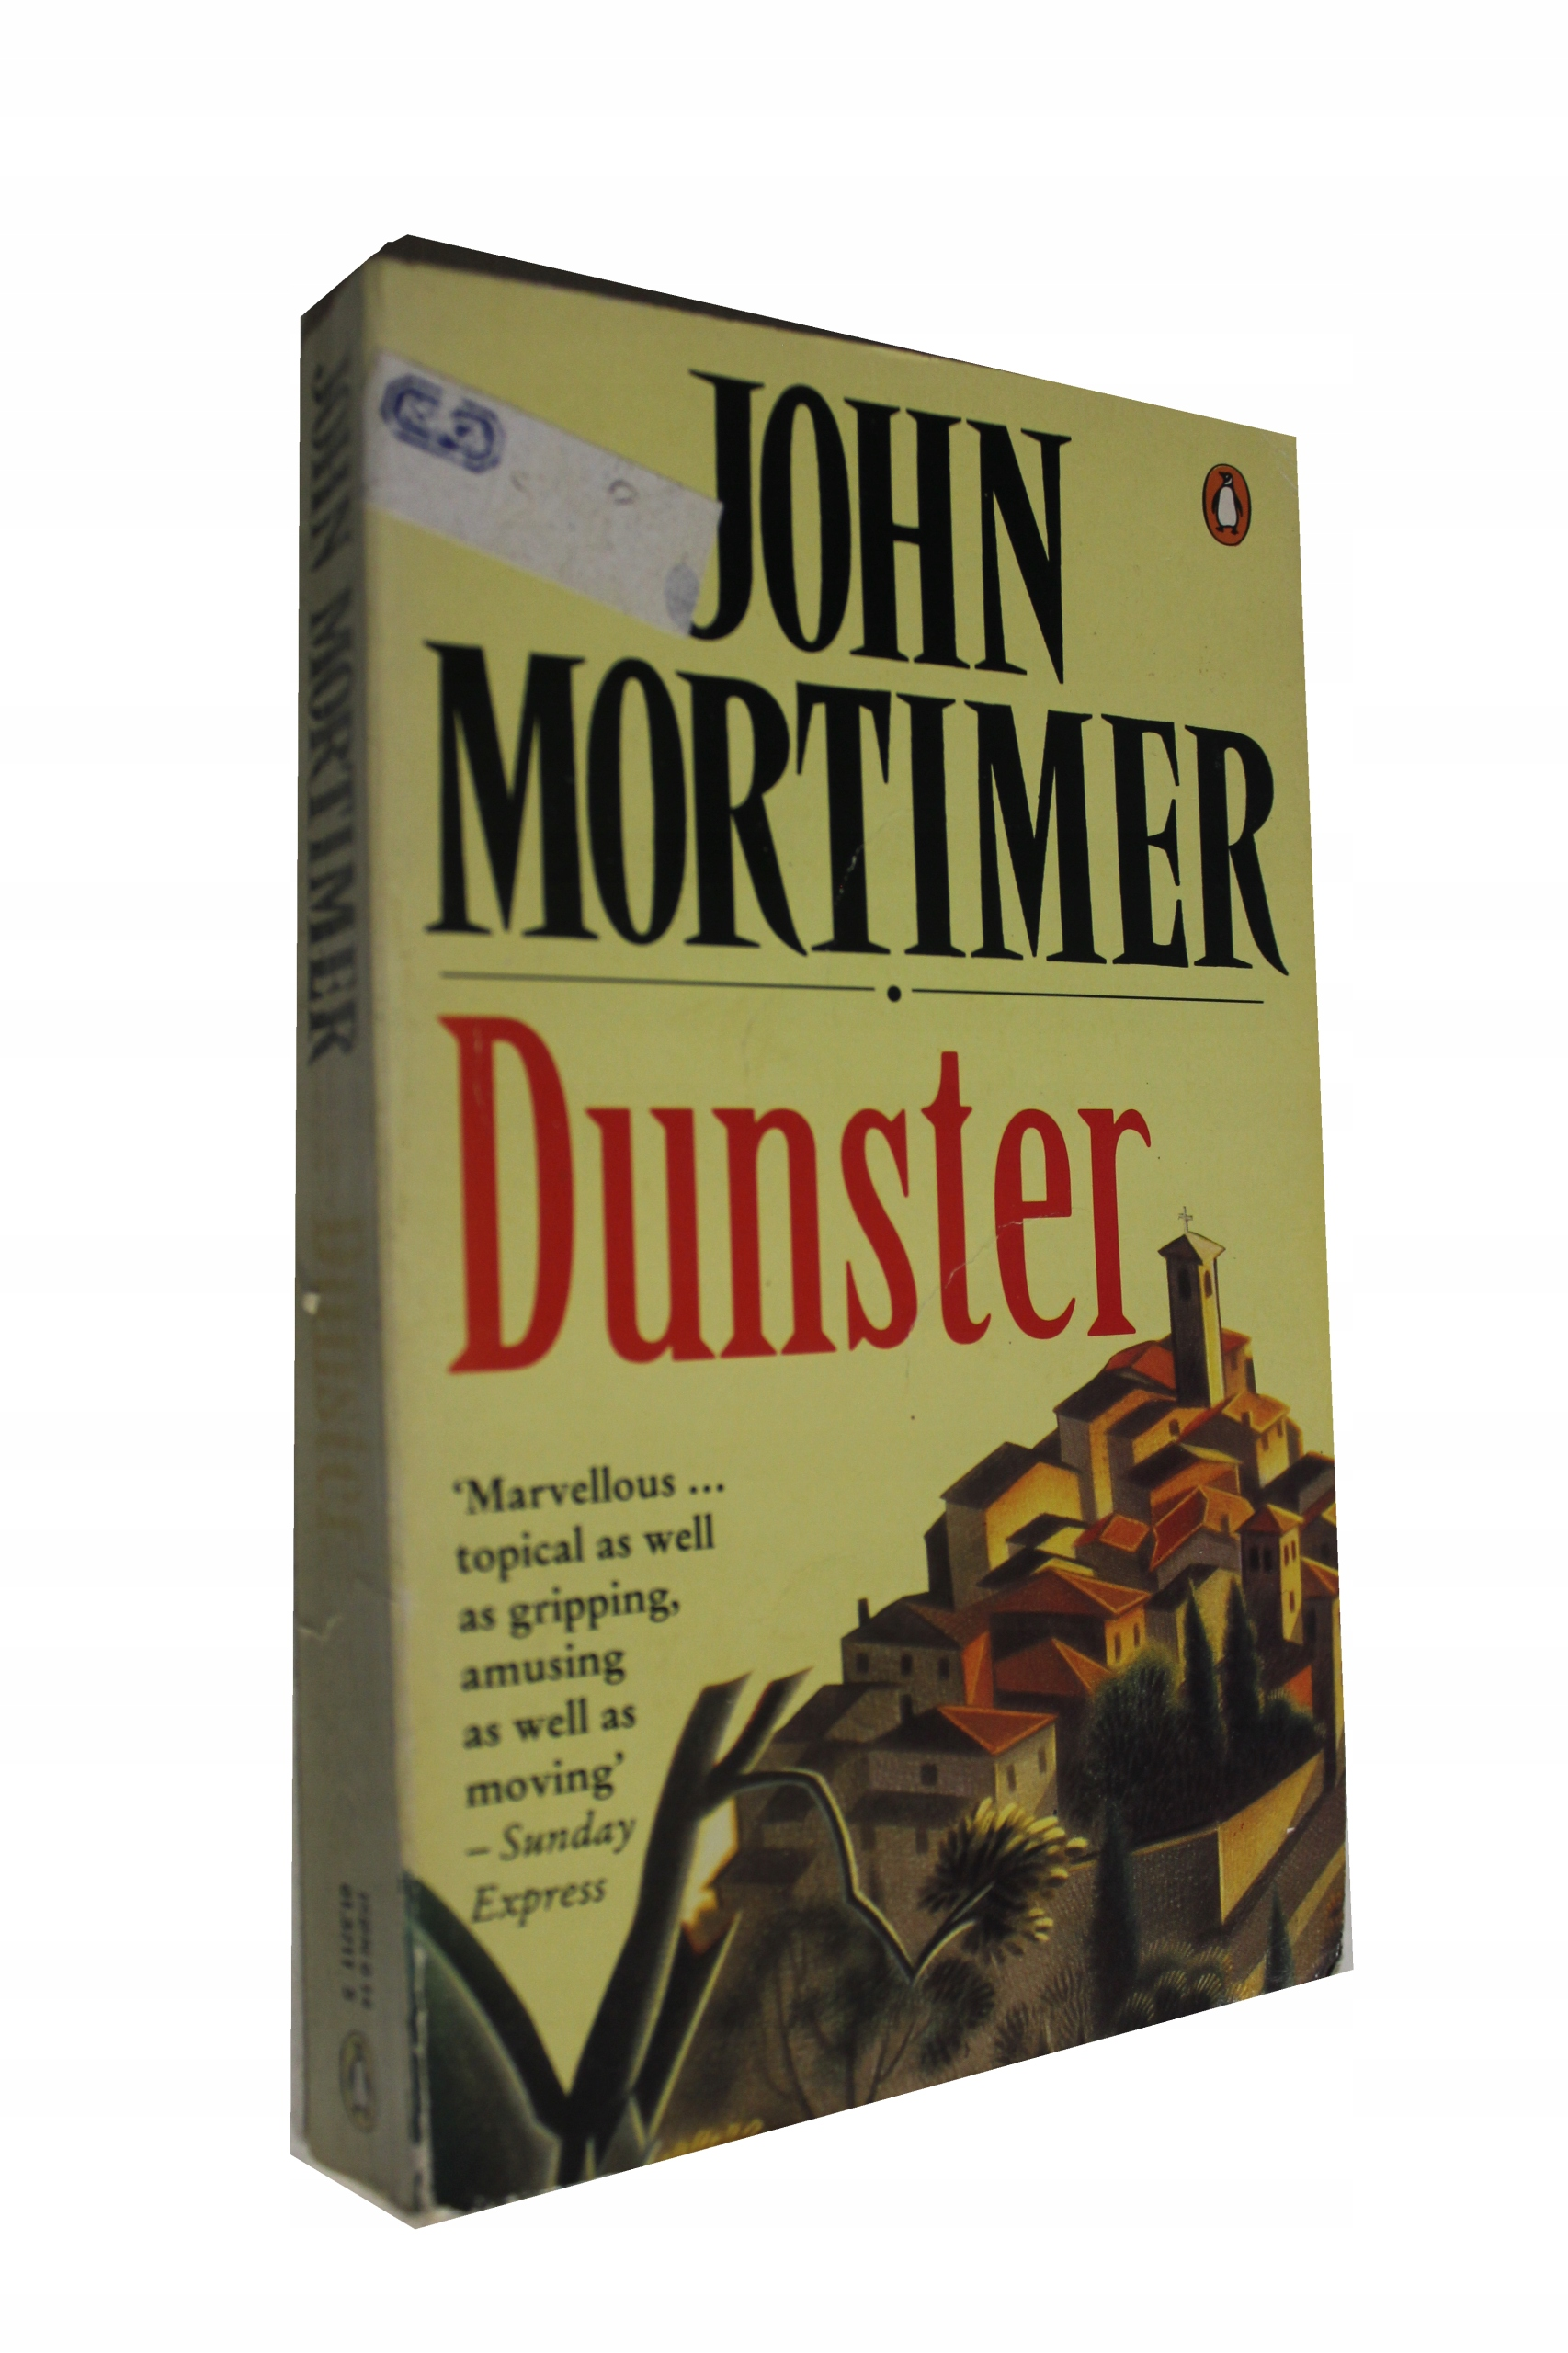 Sir John Mortimer - Dunster